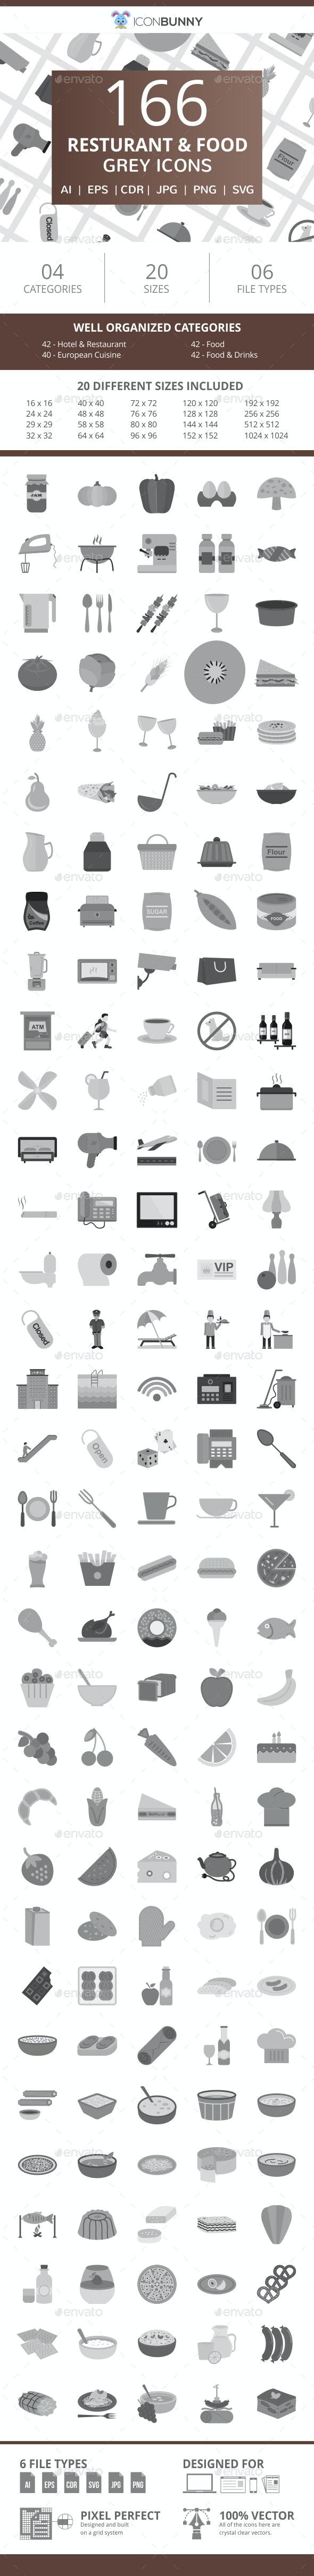 166 Restaurant & Food Flat Greyscale Icons - Icons